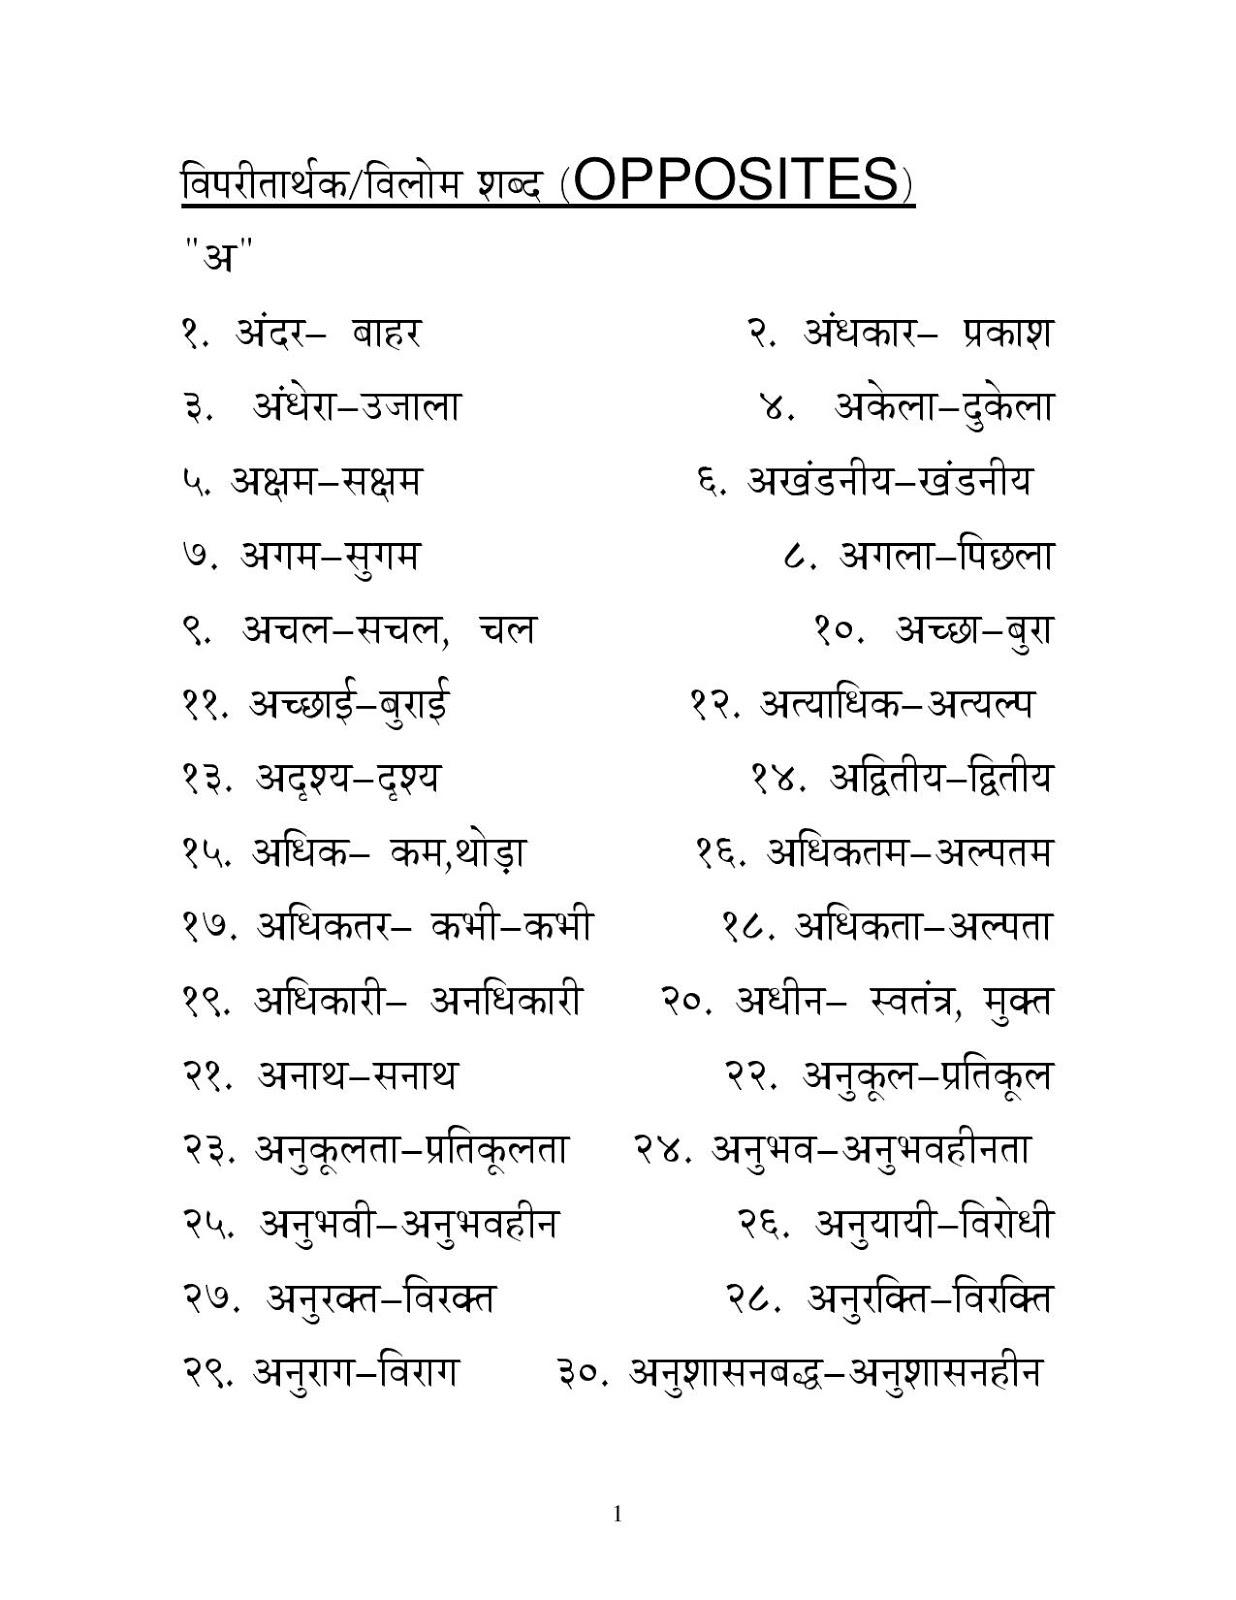 worksheet Hindi Grammar Worksheets For Class 6 hindi grammar work sheet collection for classes 56 7 8